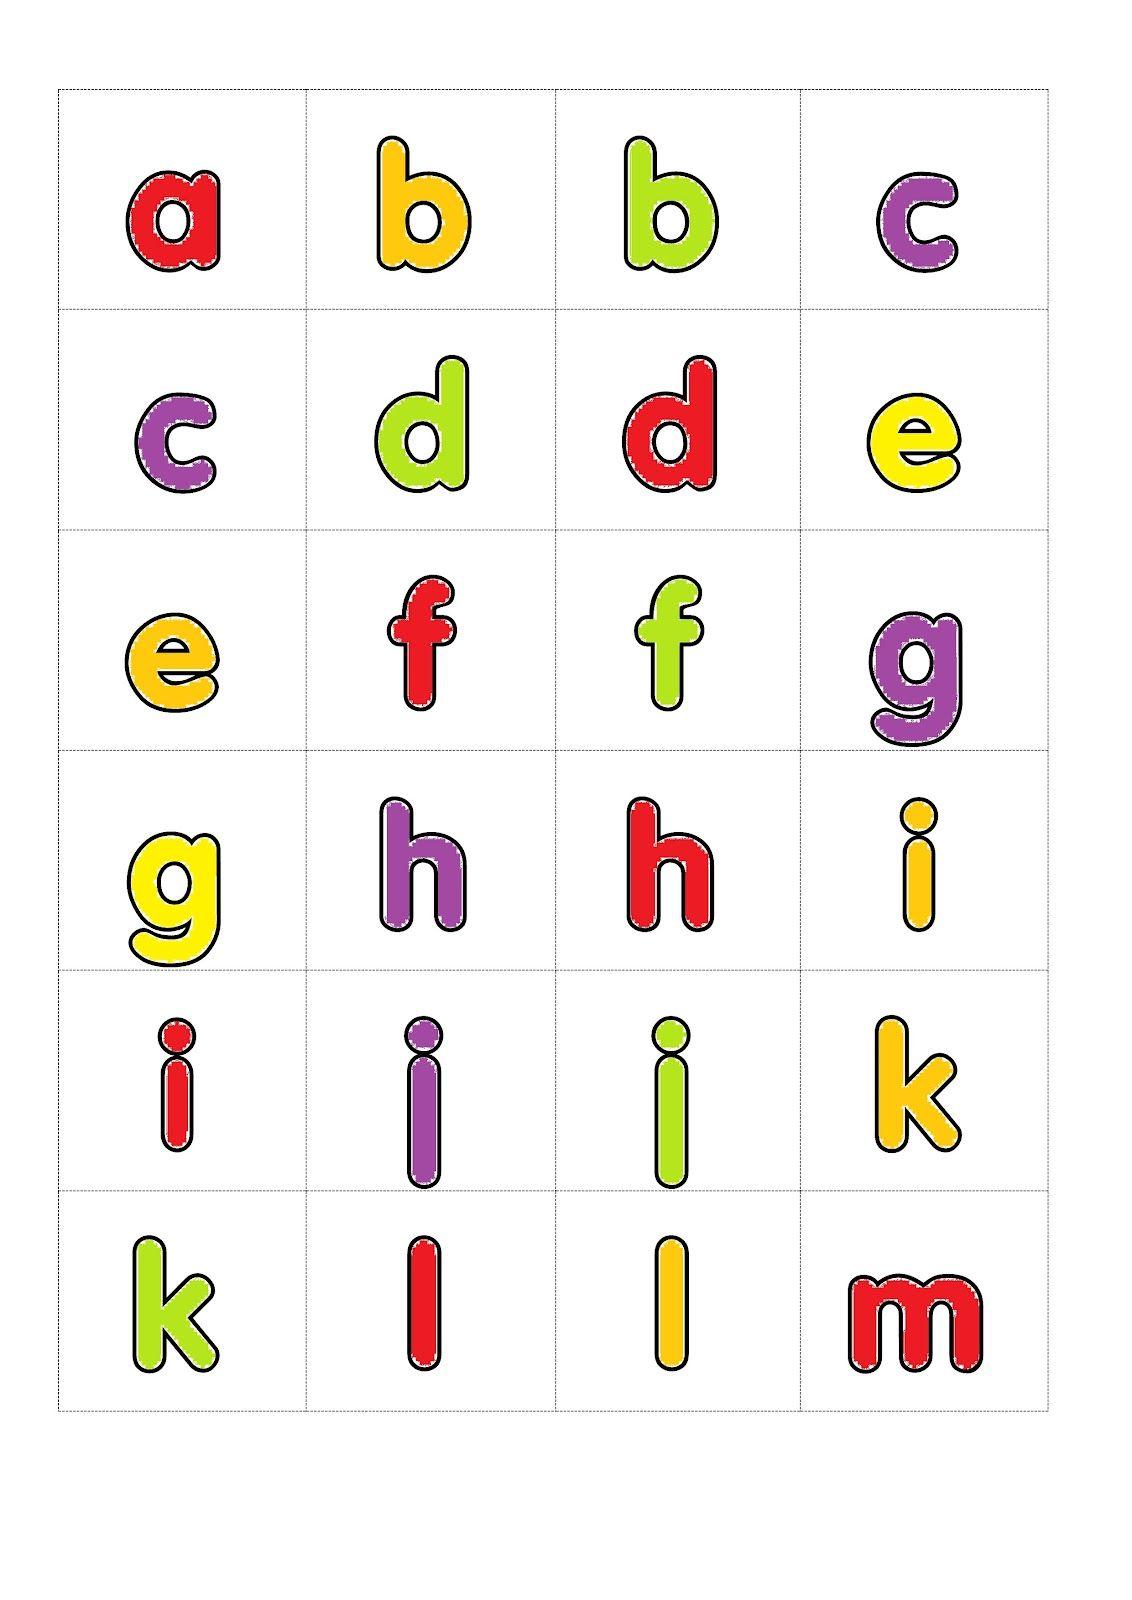 Printable Alphabet Games Memory Letter Tiles Small